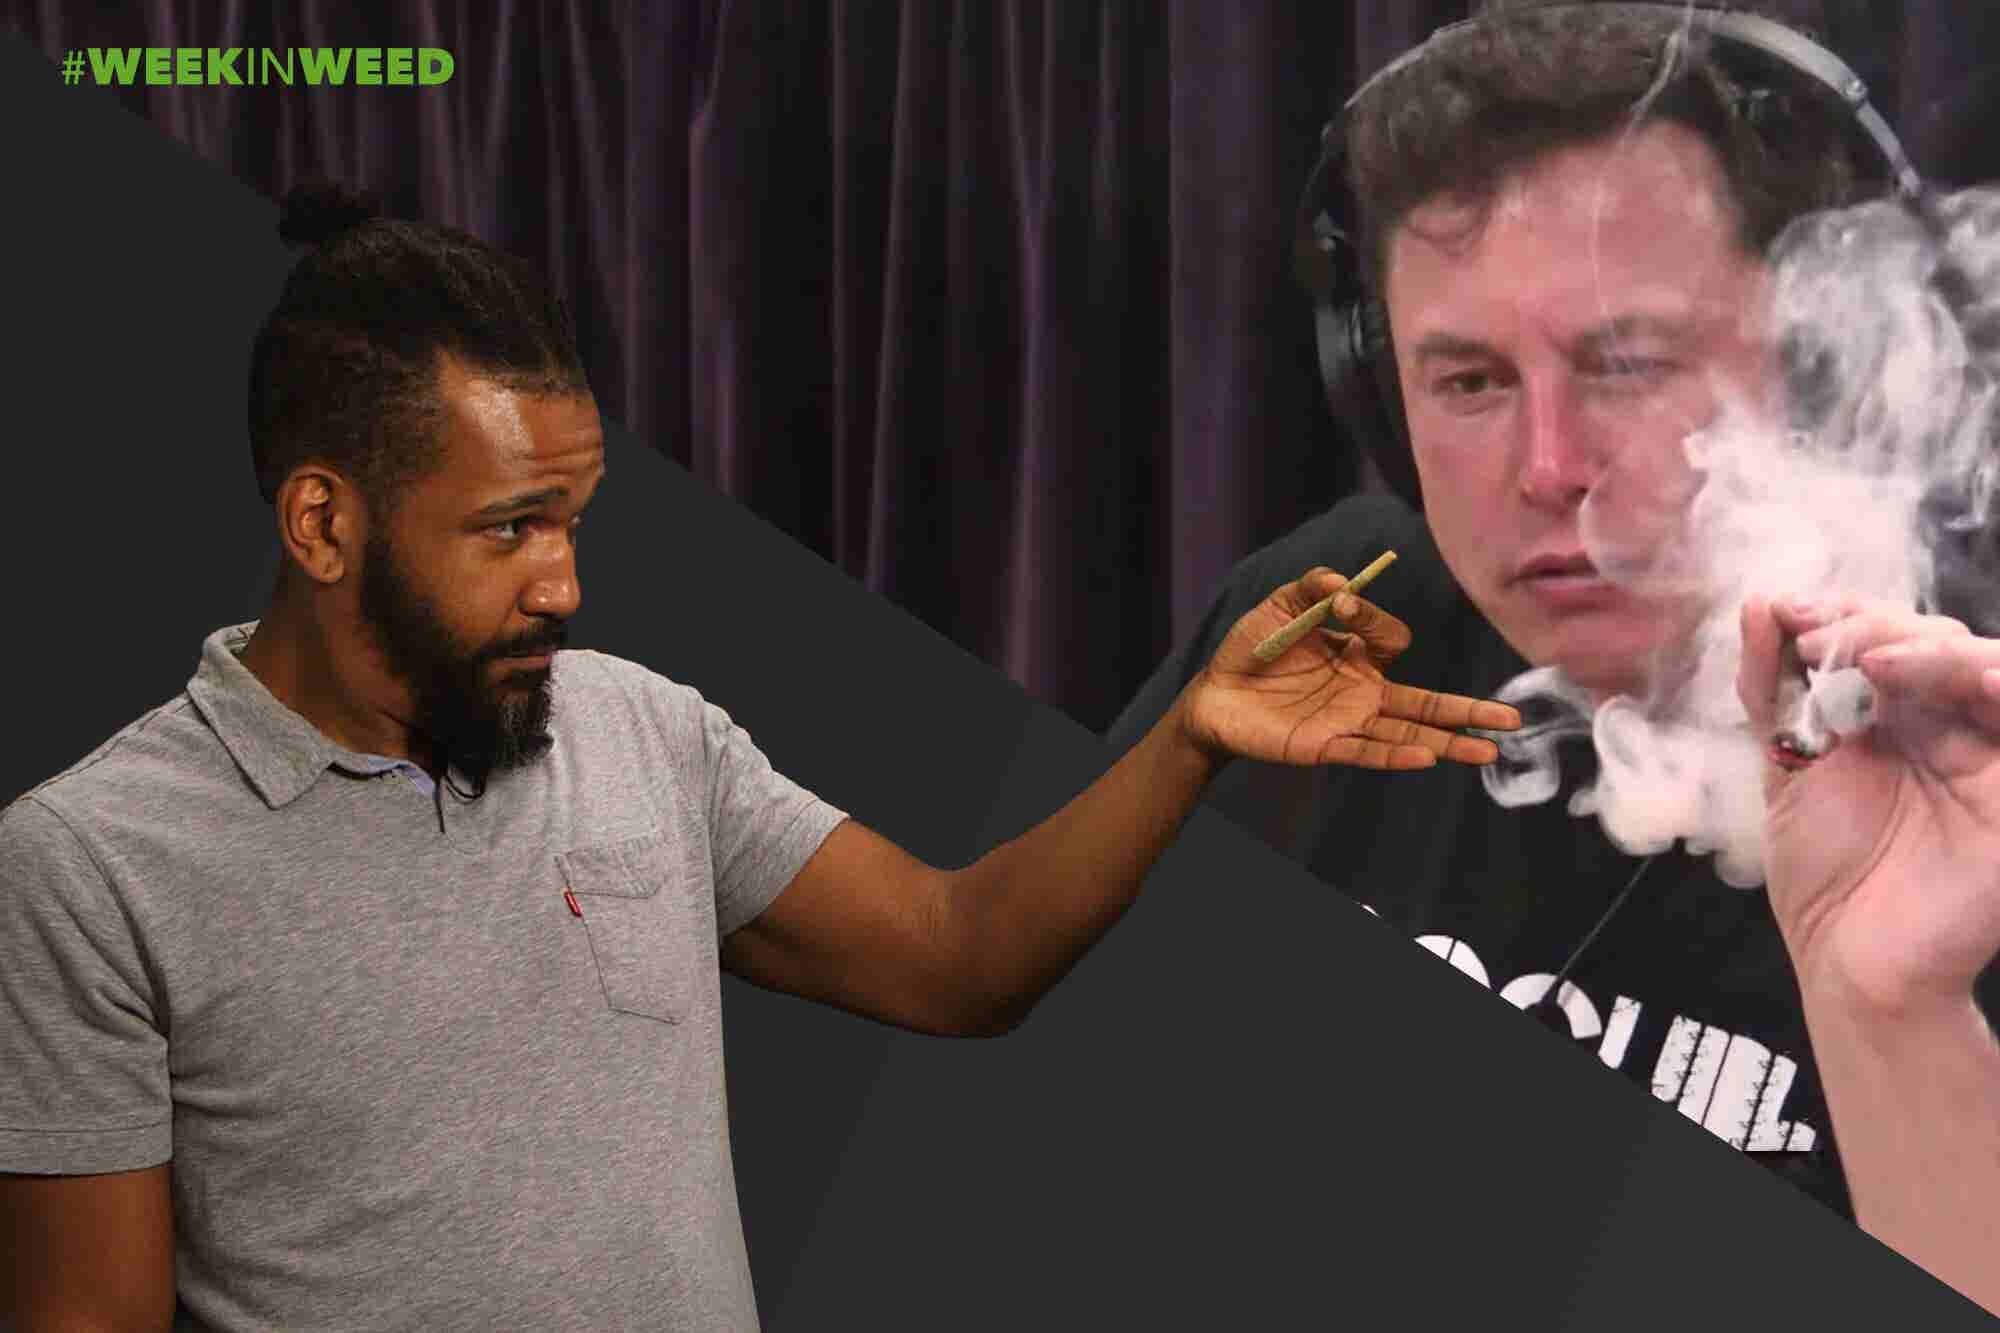 This Week in Weed: Elon Musk Smokes Pot!